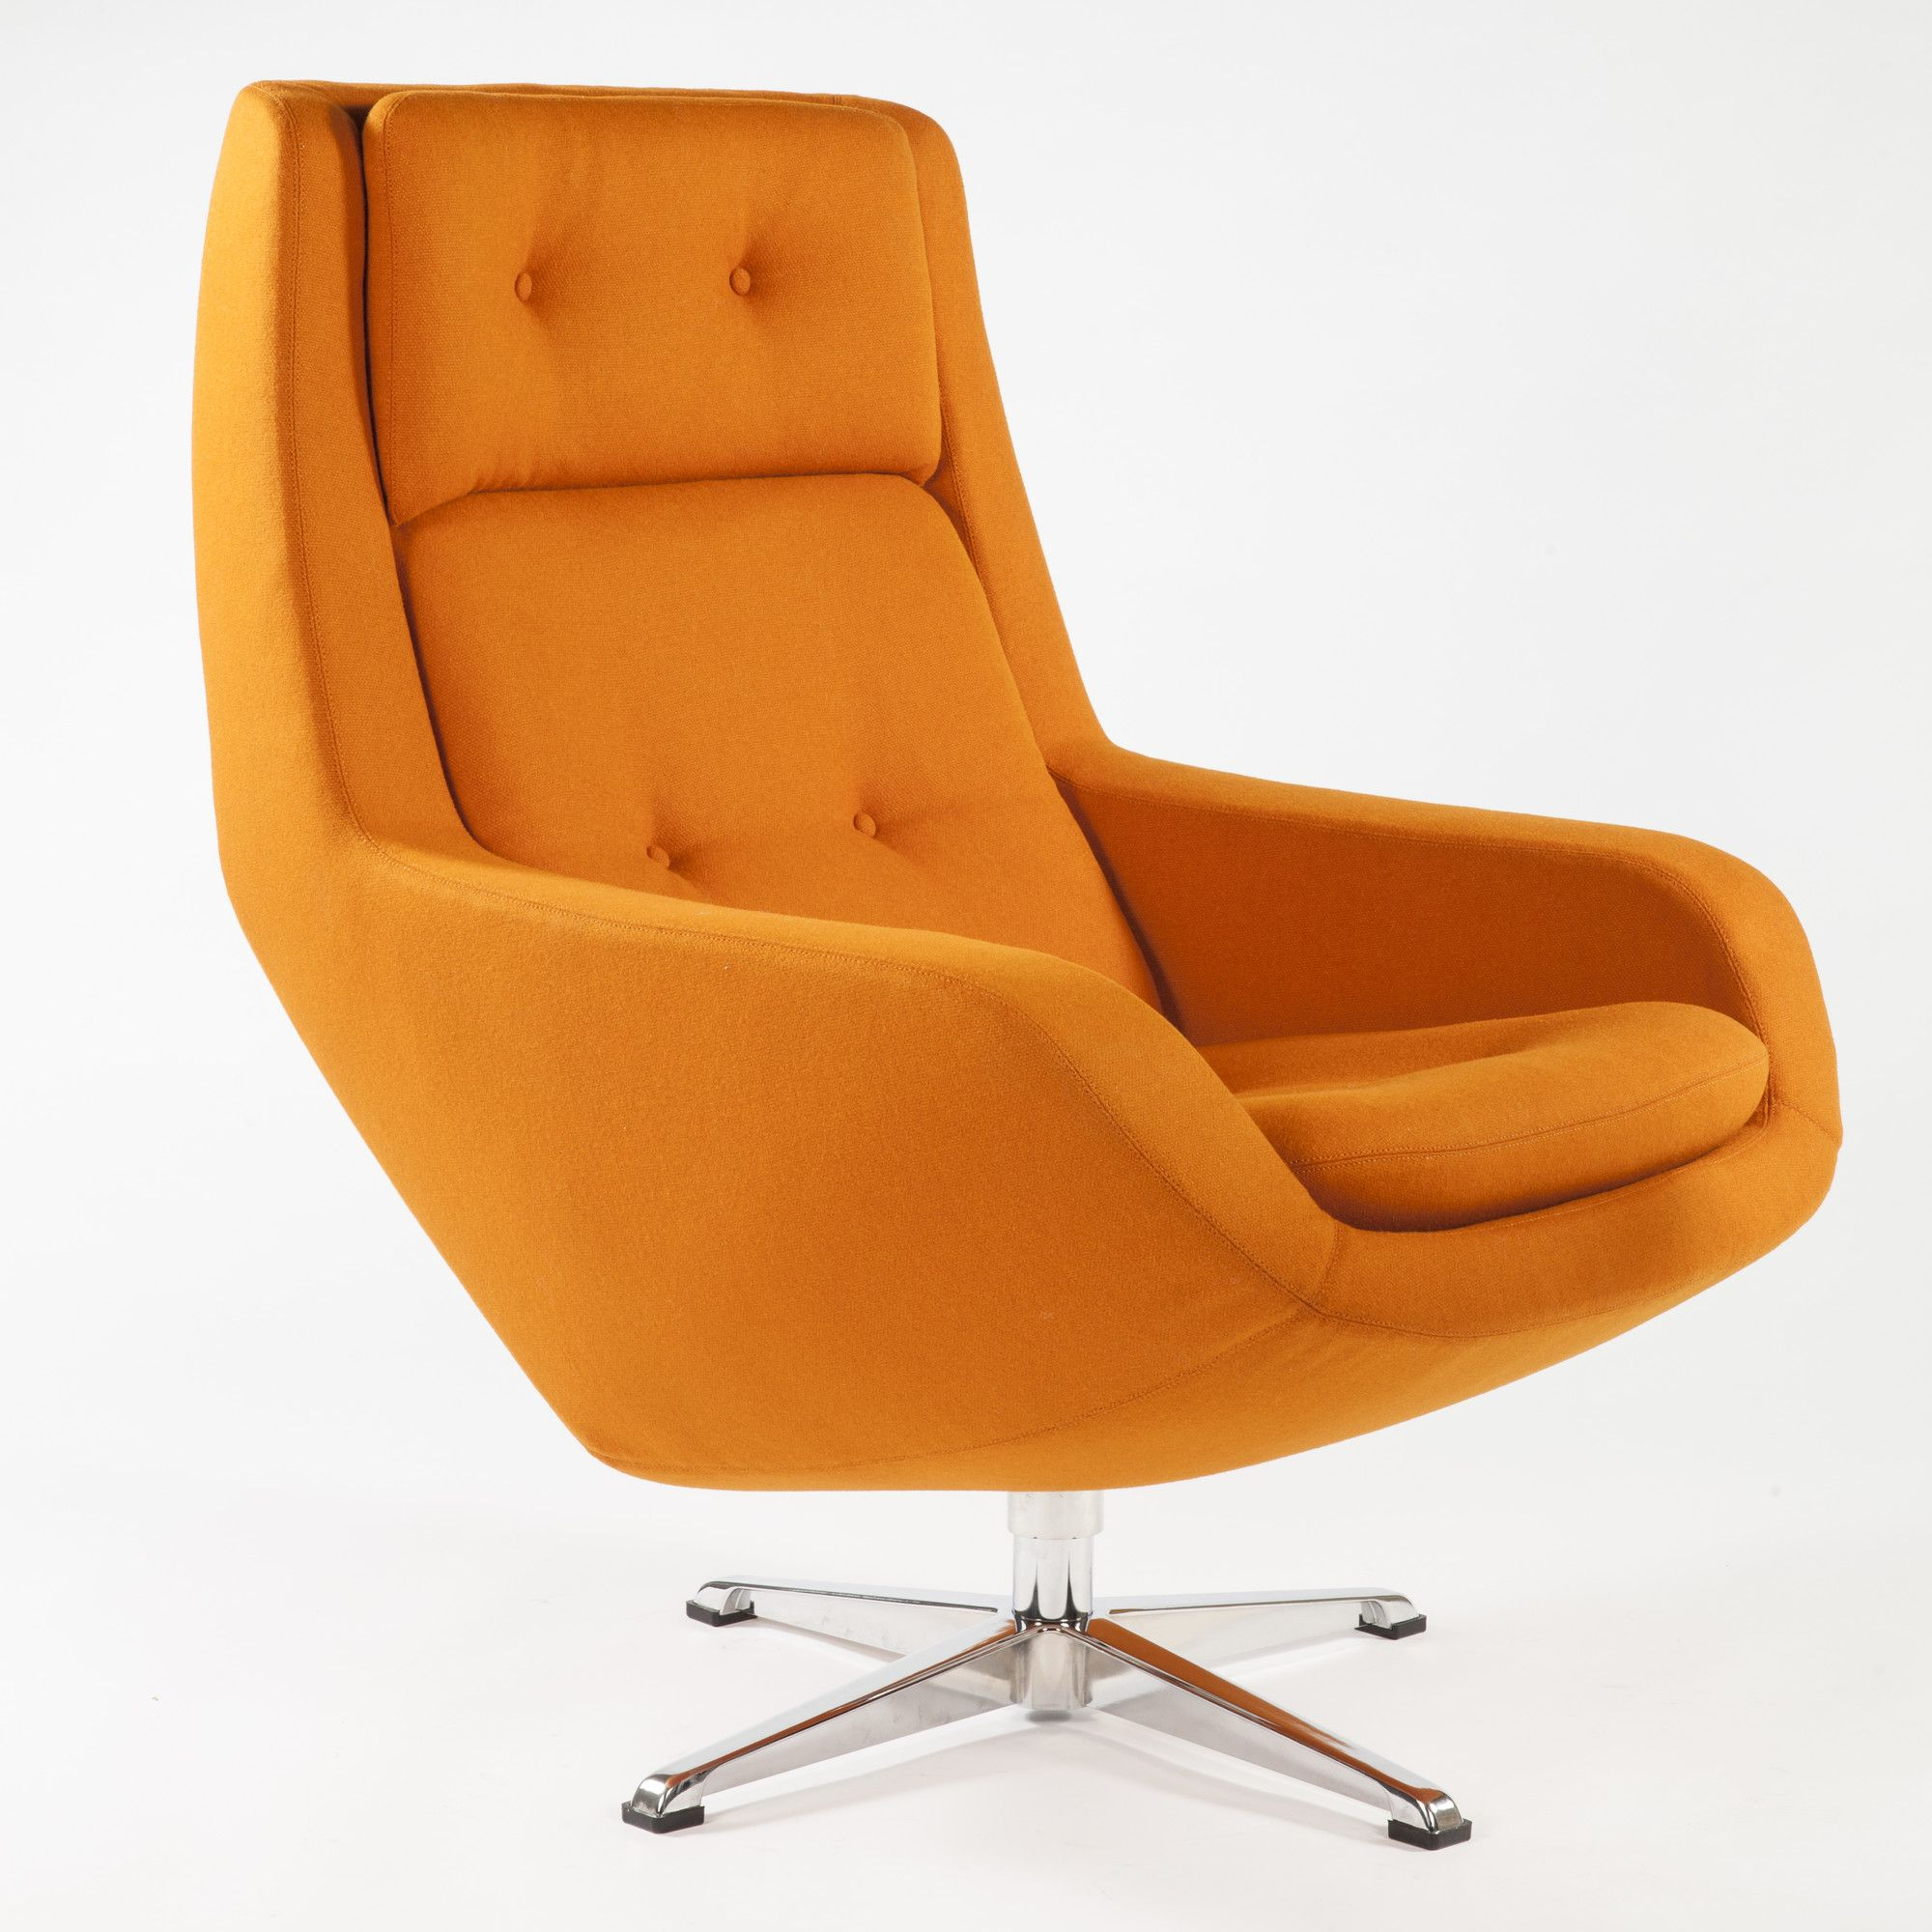 Delightful DCOR Design Limburg Lounge Chair | AllModern